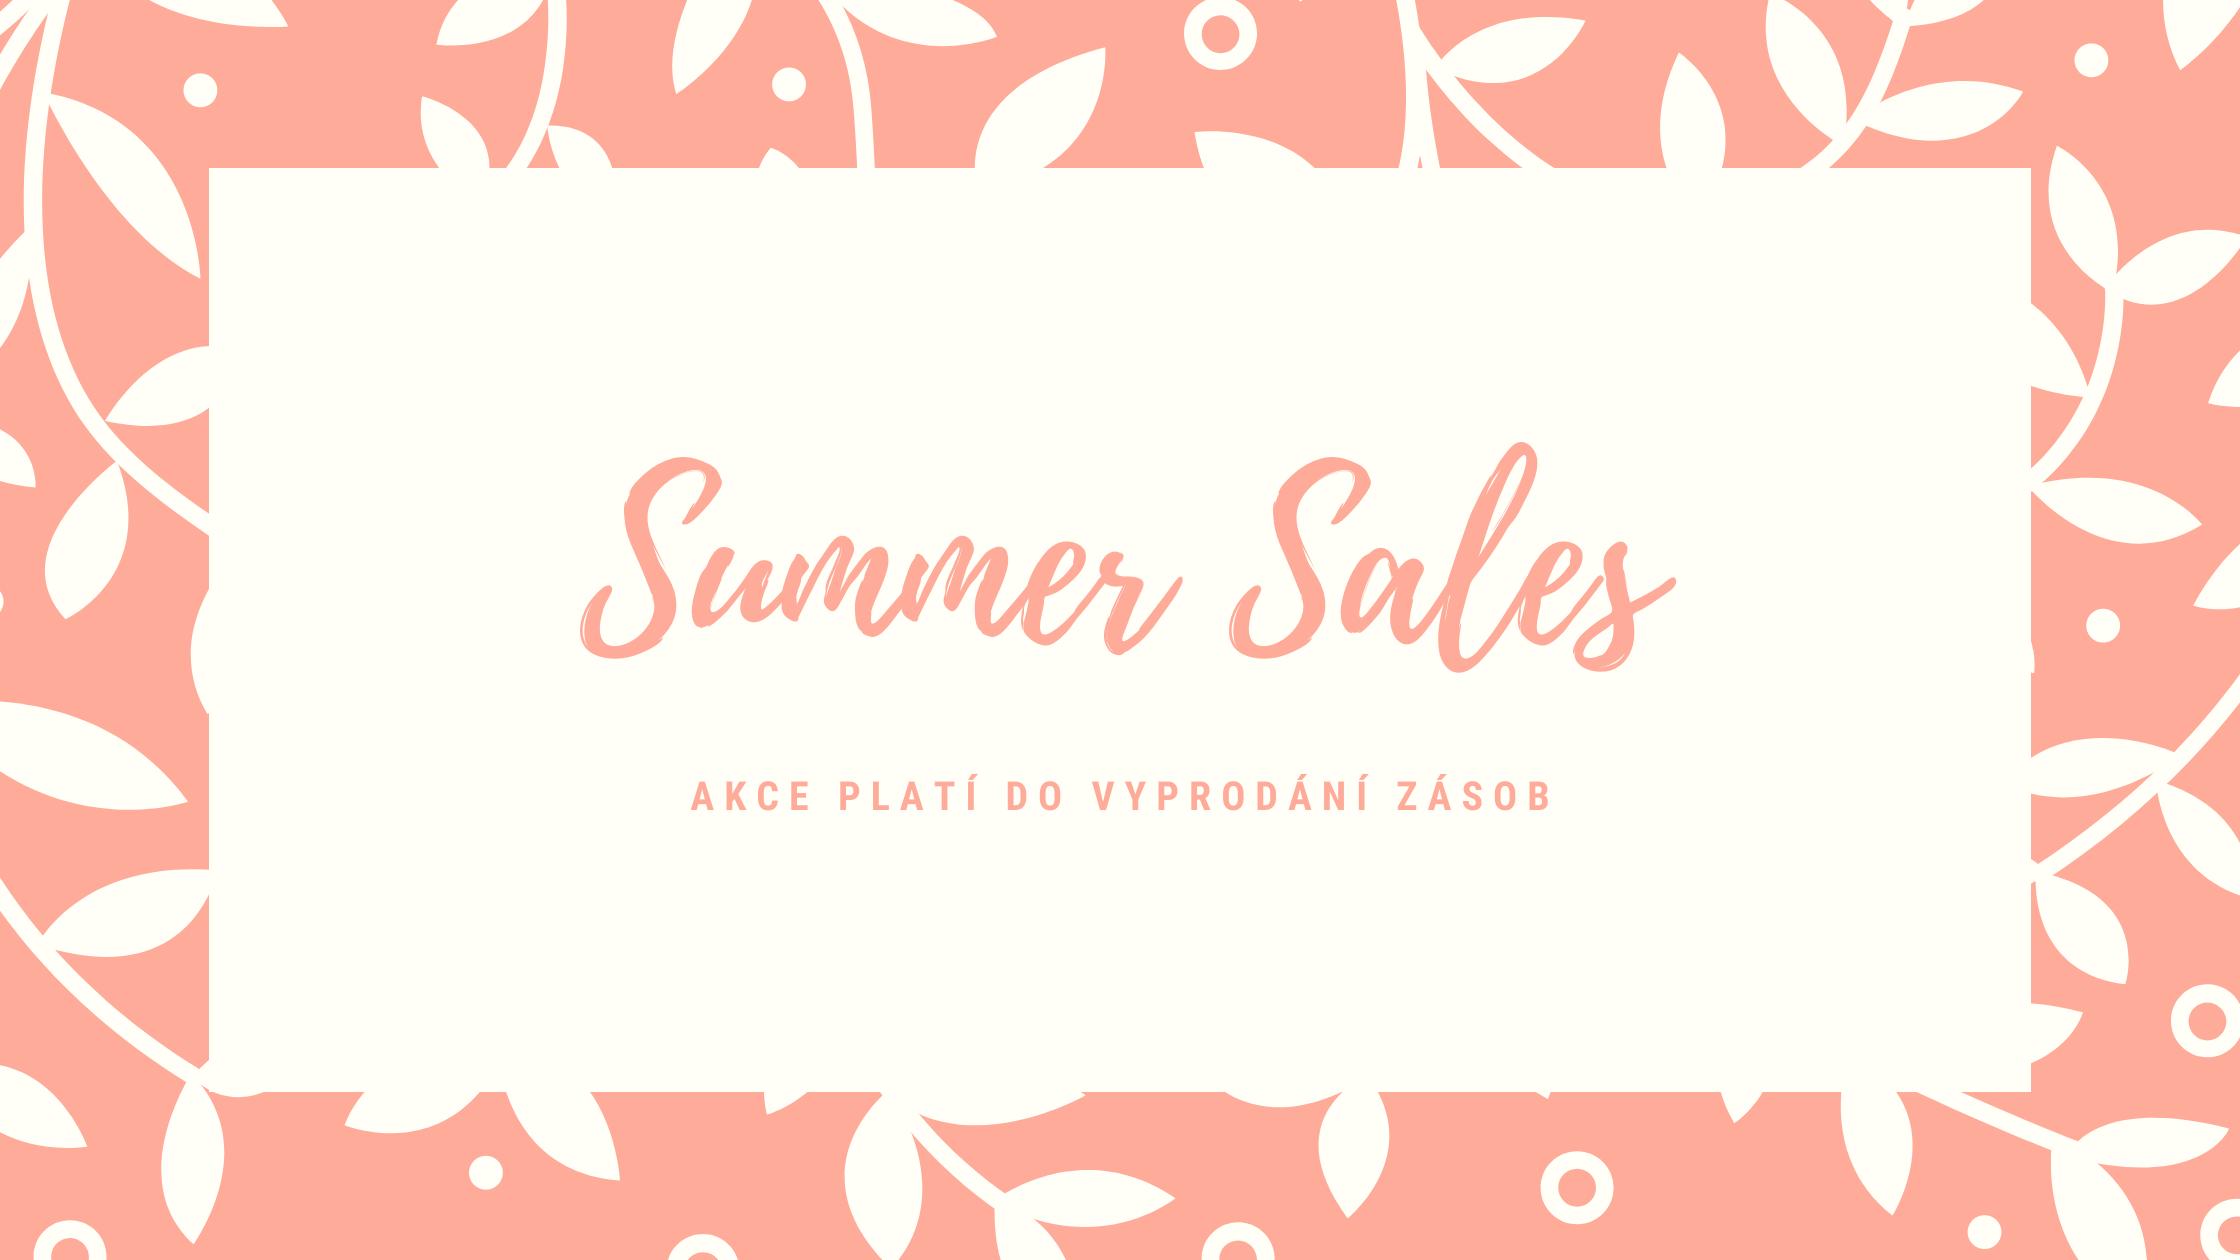 summer sales 2021